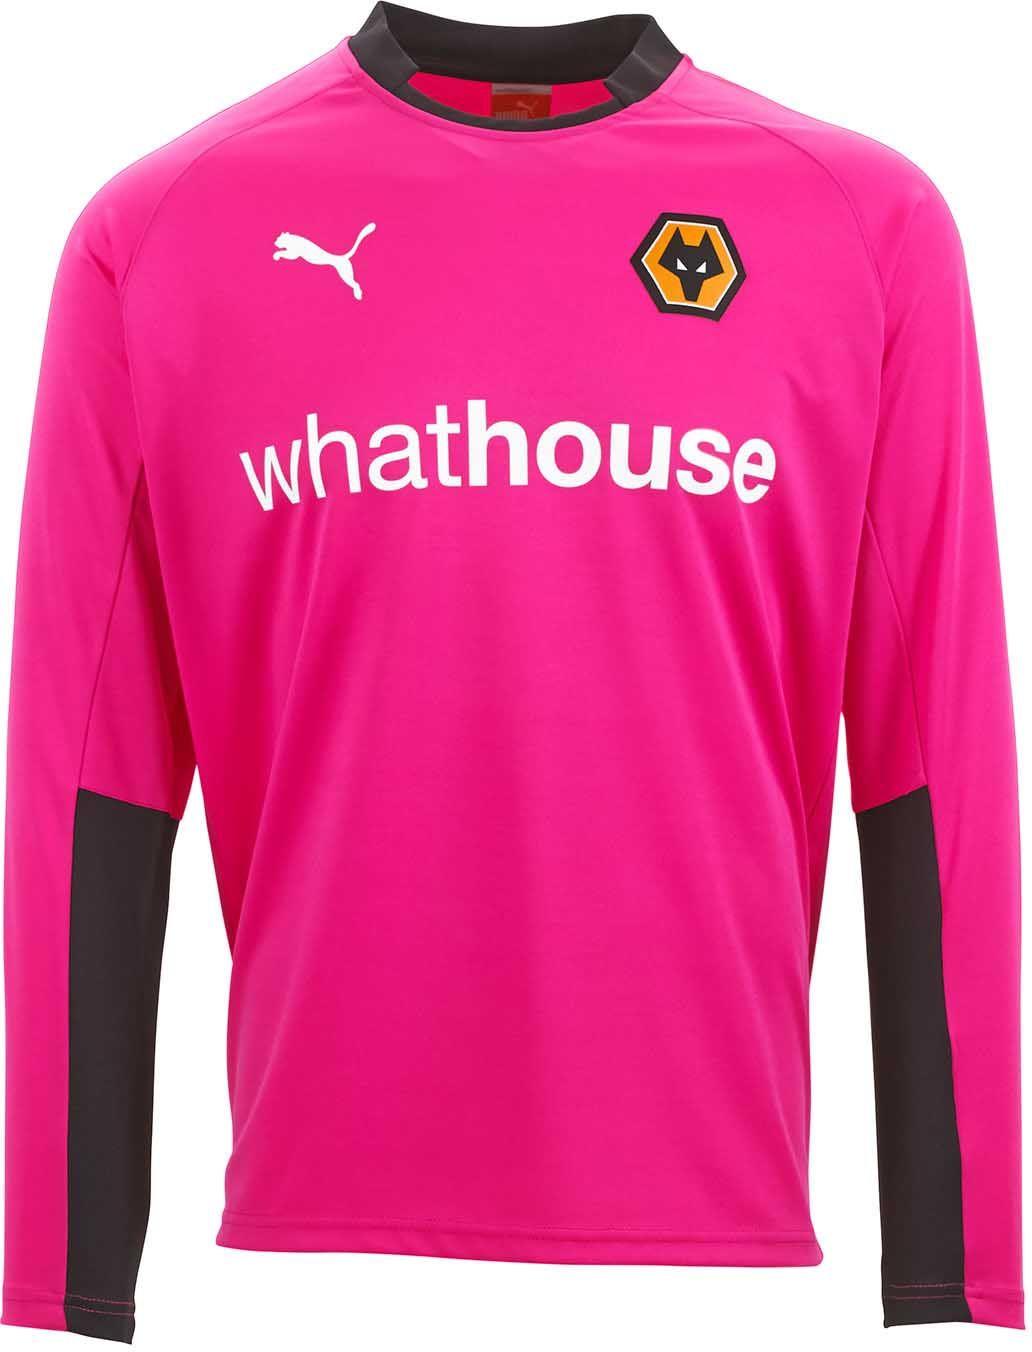 fe98e1eb wolverhampton wanderers pink goalie shirt - Google Search | Pink ...